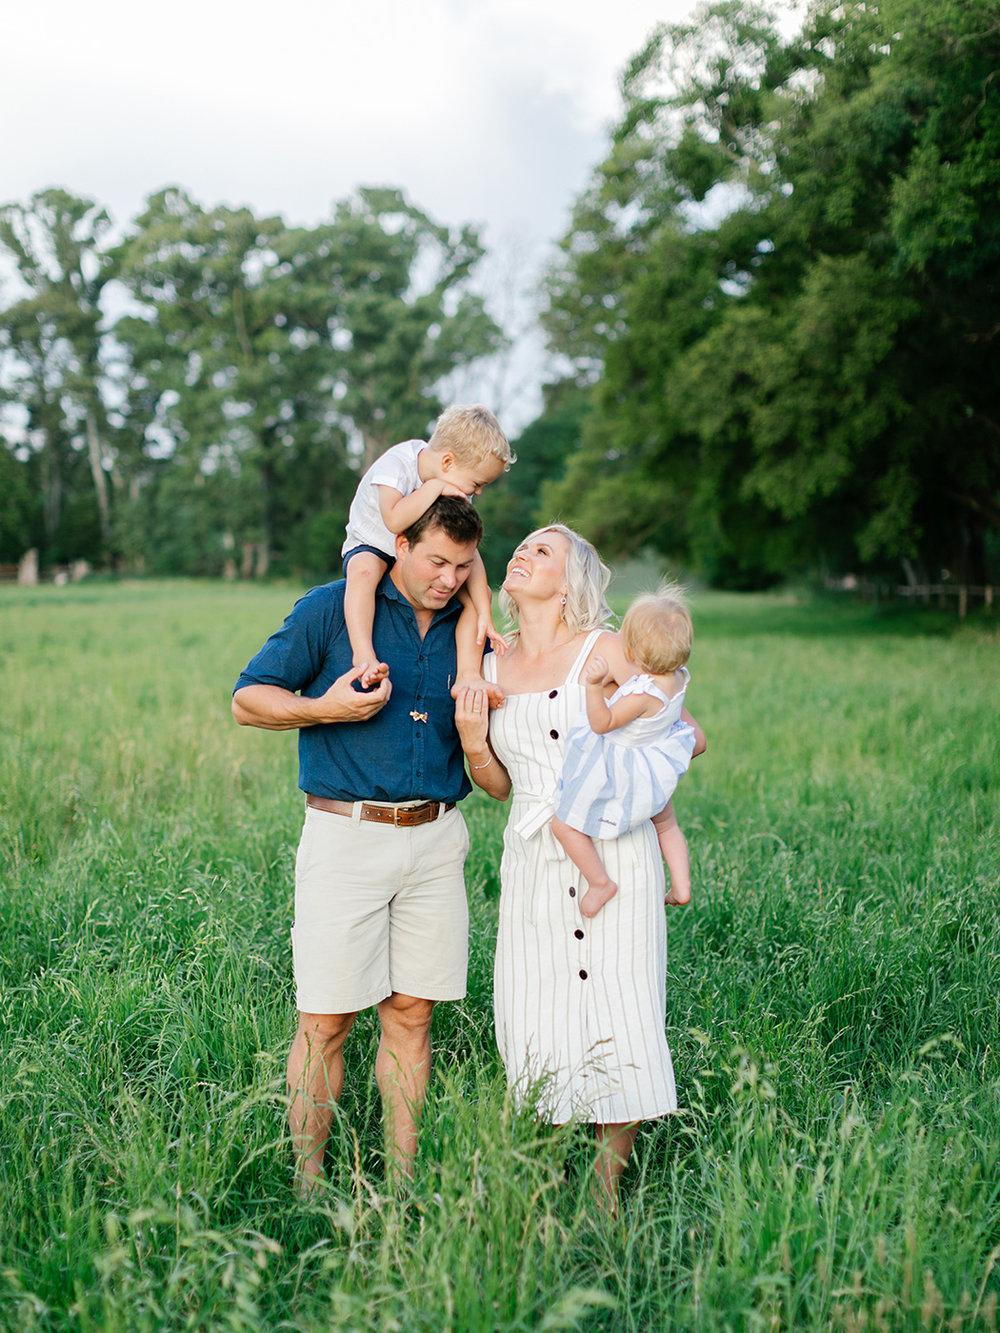 Irene Dairy Farm Family Shoot | Rensche Mari Photography